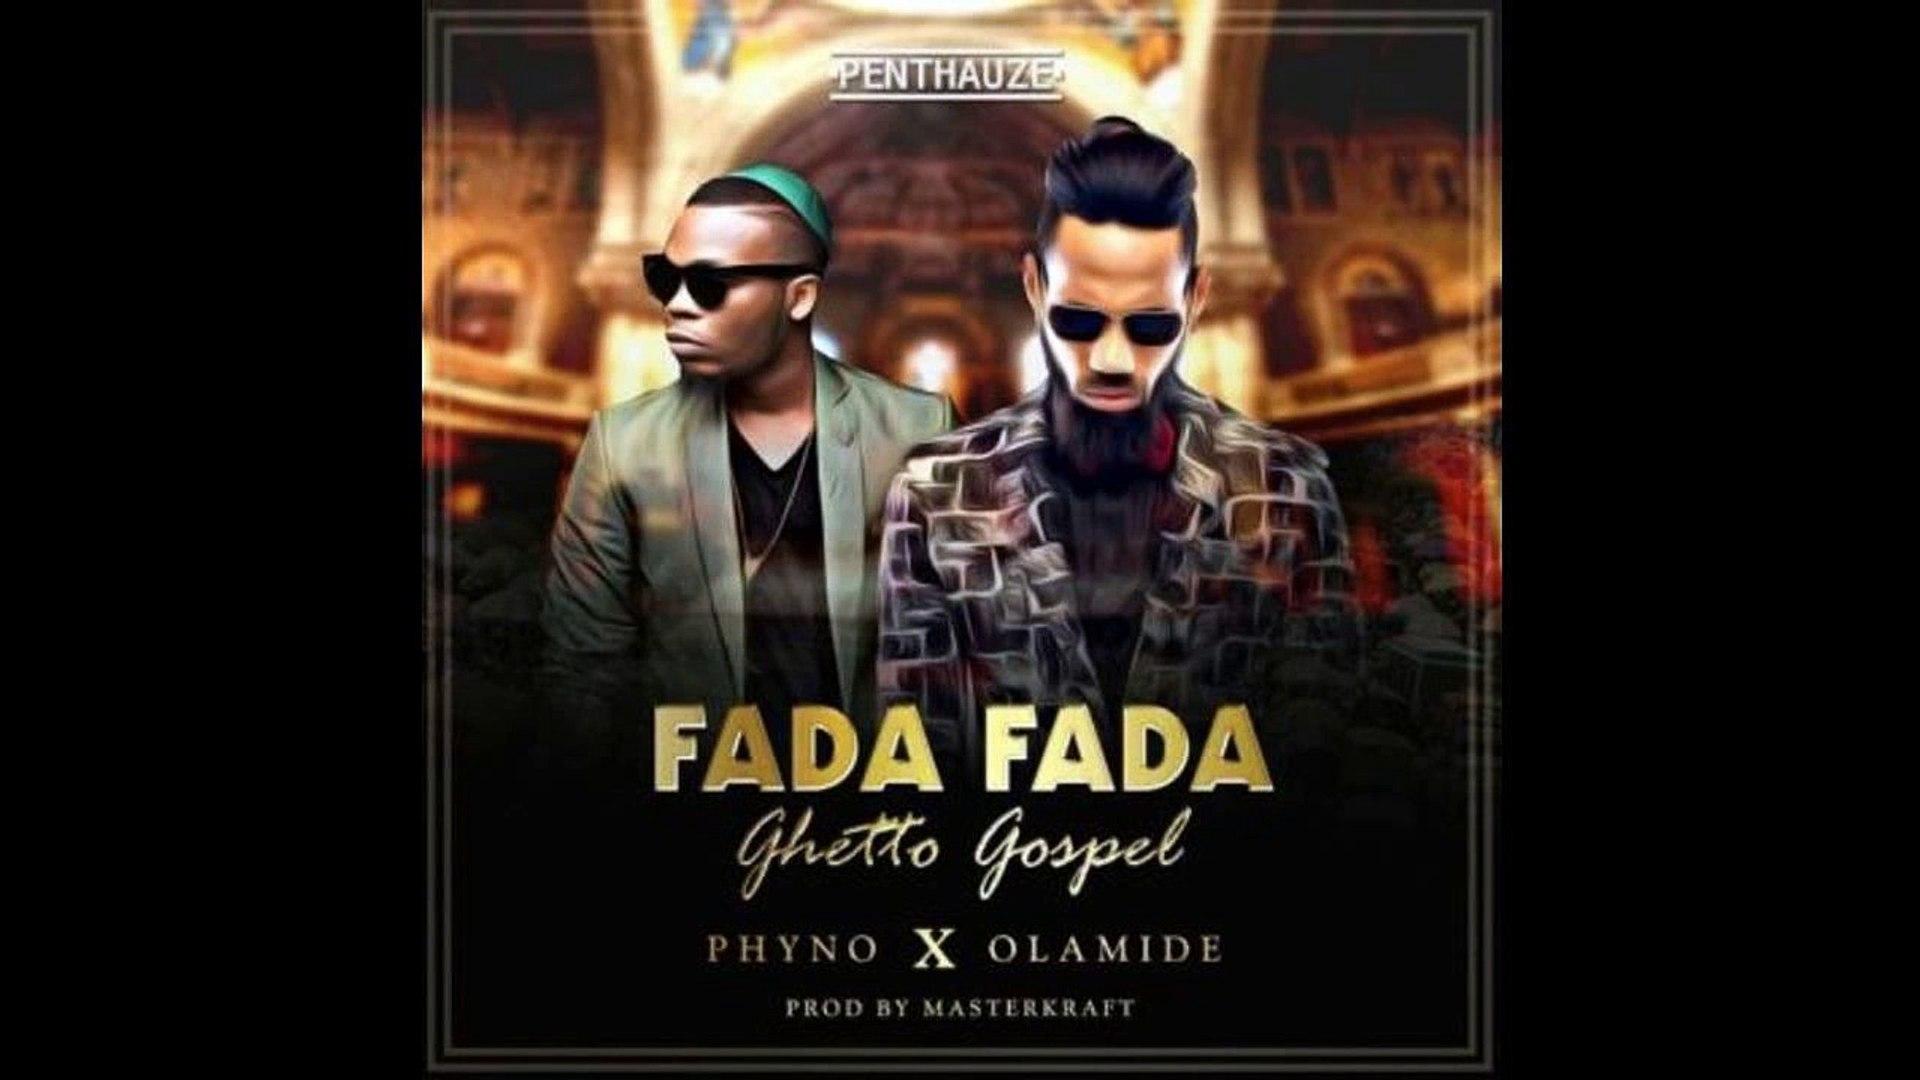 Phyno ft Olamide – Fada Fada (Ghetto Gospel) (NEW MUSIC 2016)